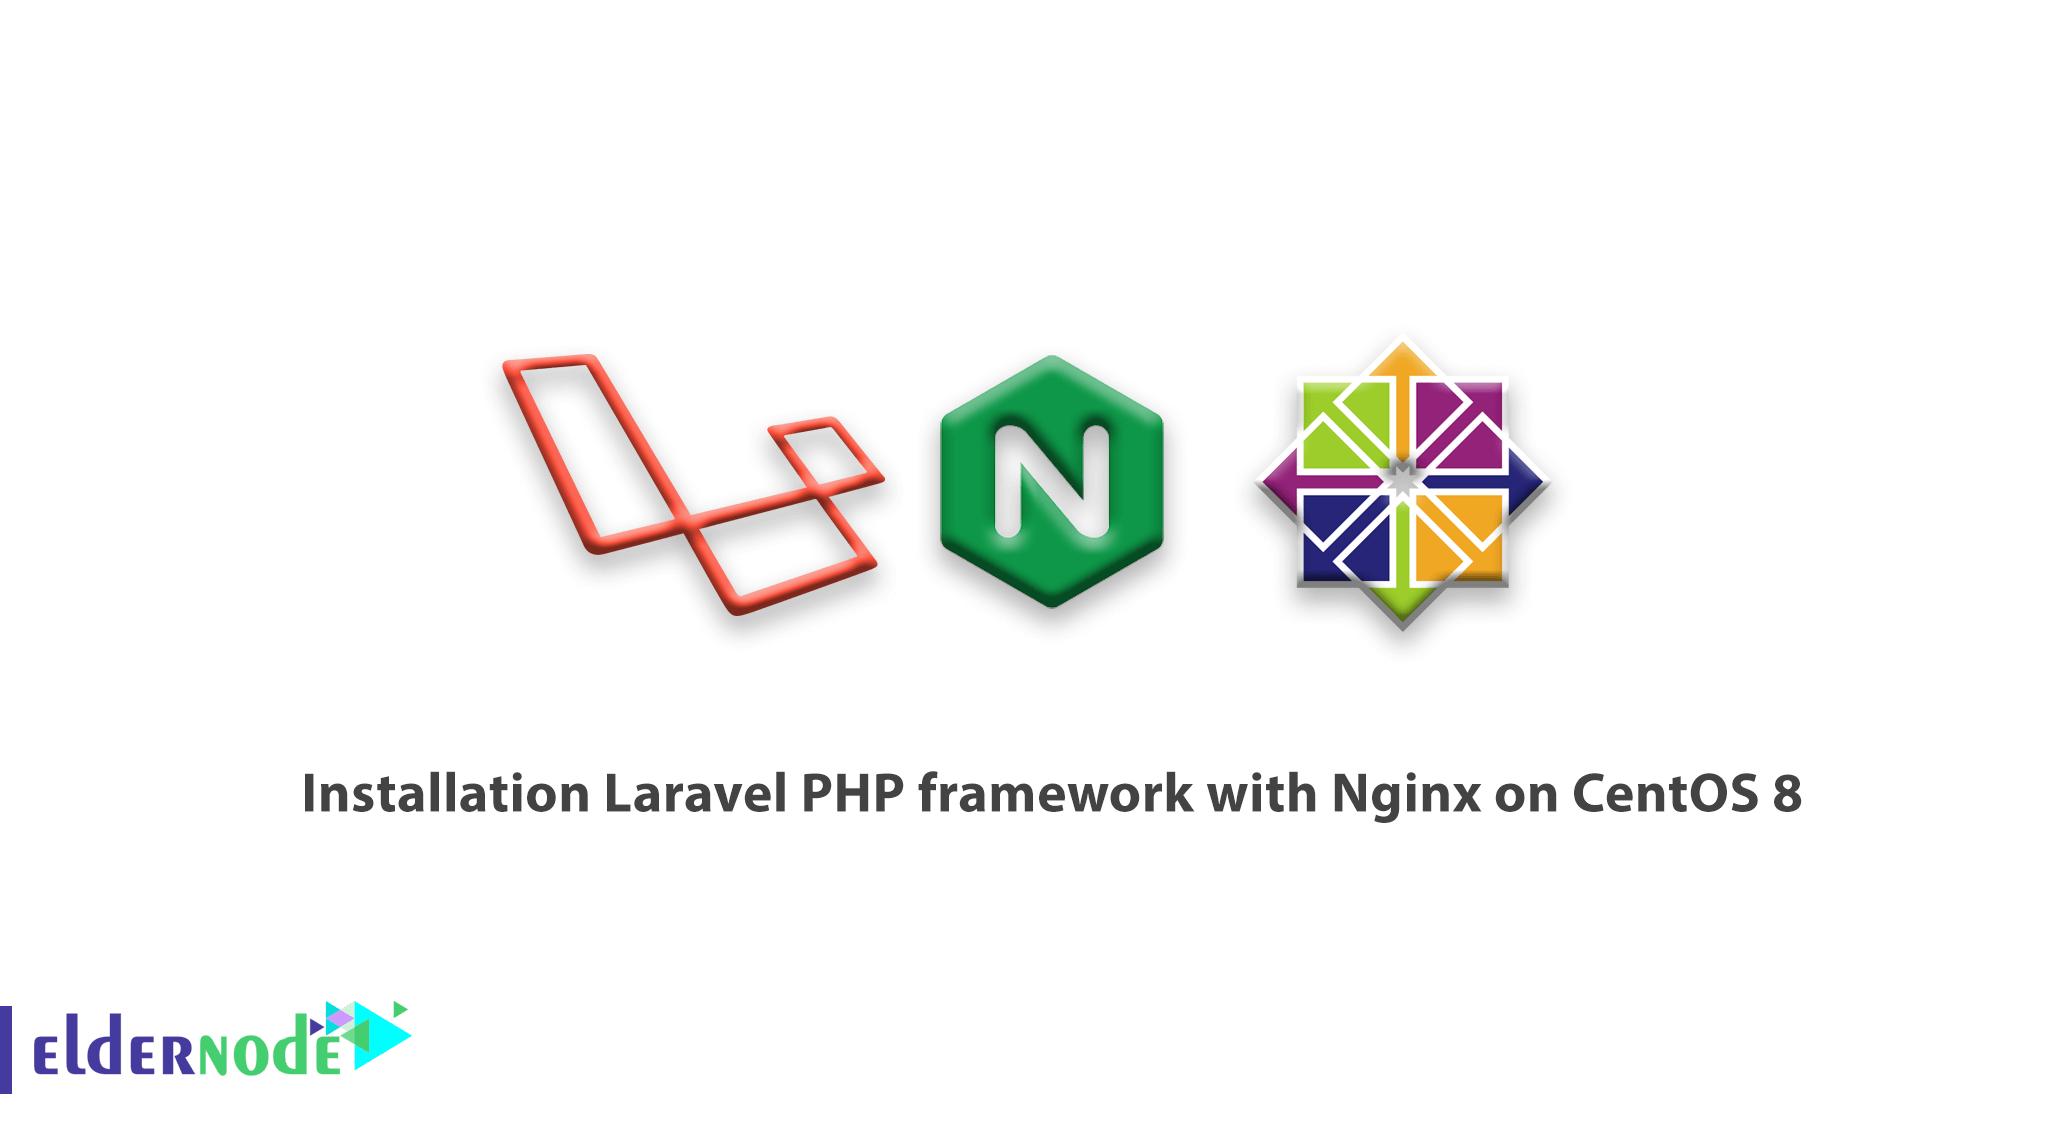 Tutorial installation Laravel PHP framework with Nginx on CentOS 8